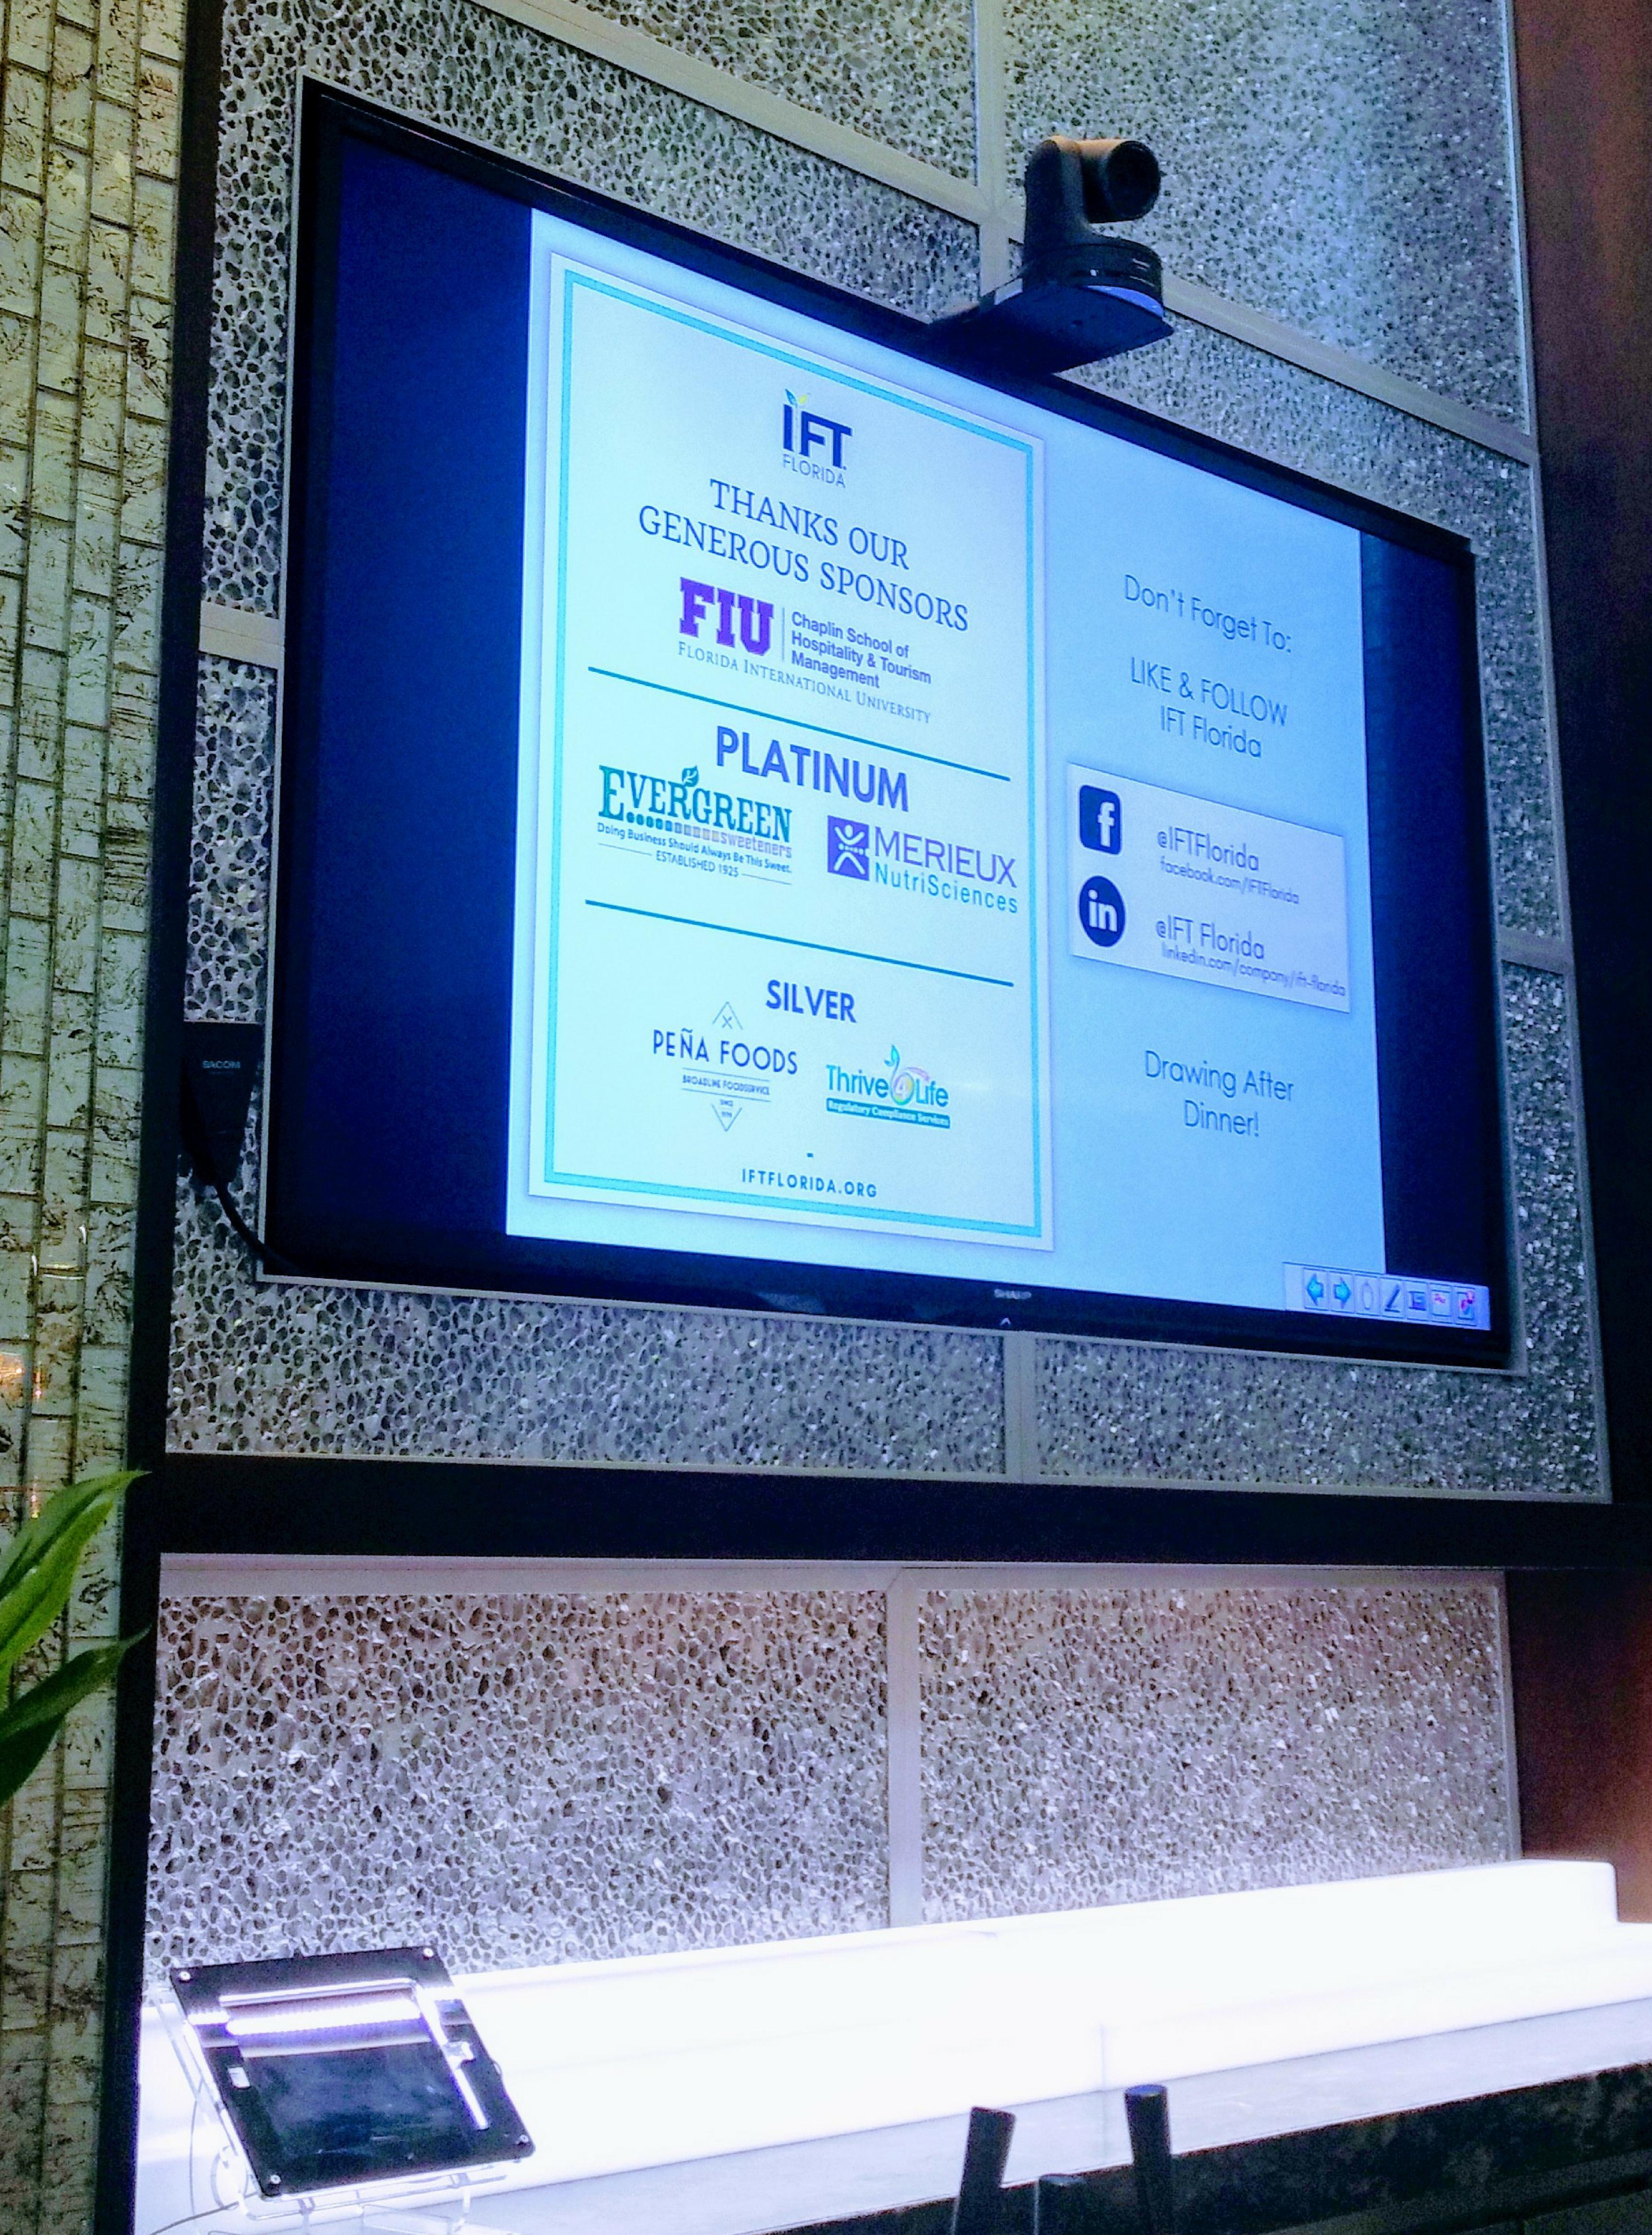 IFT Florida Sponsors